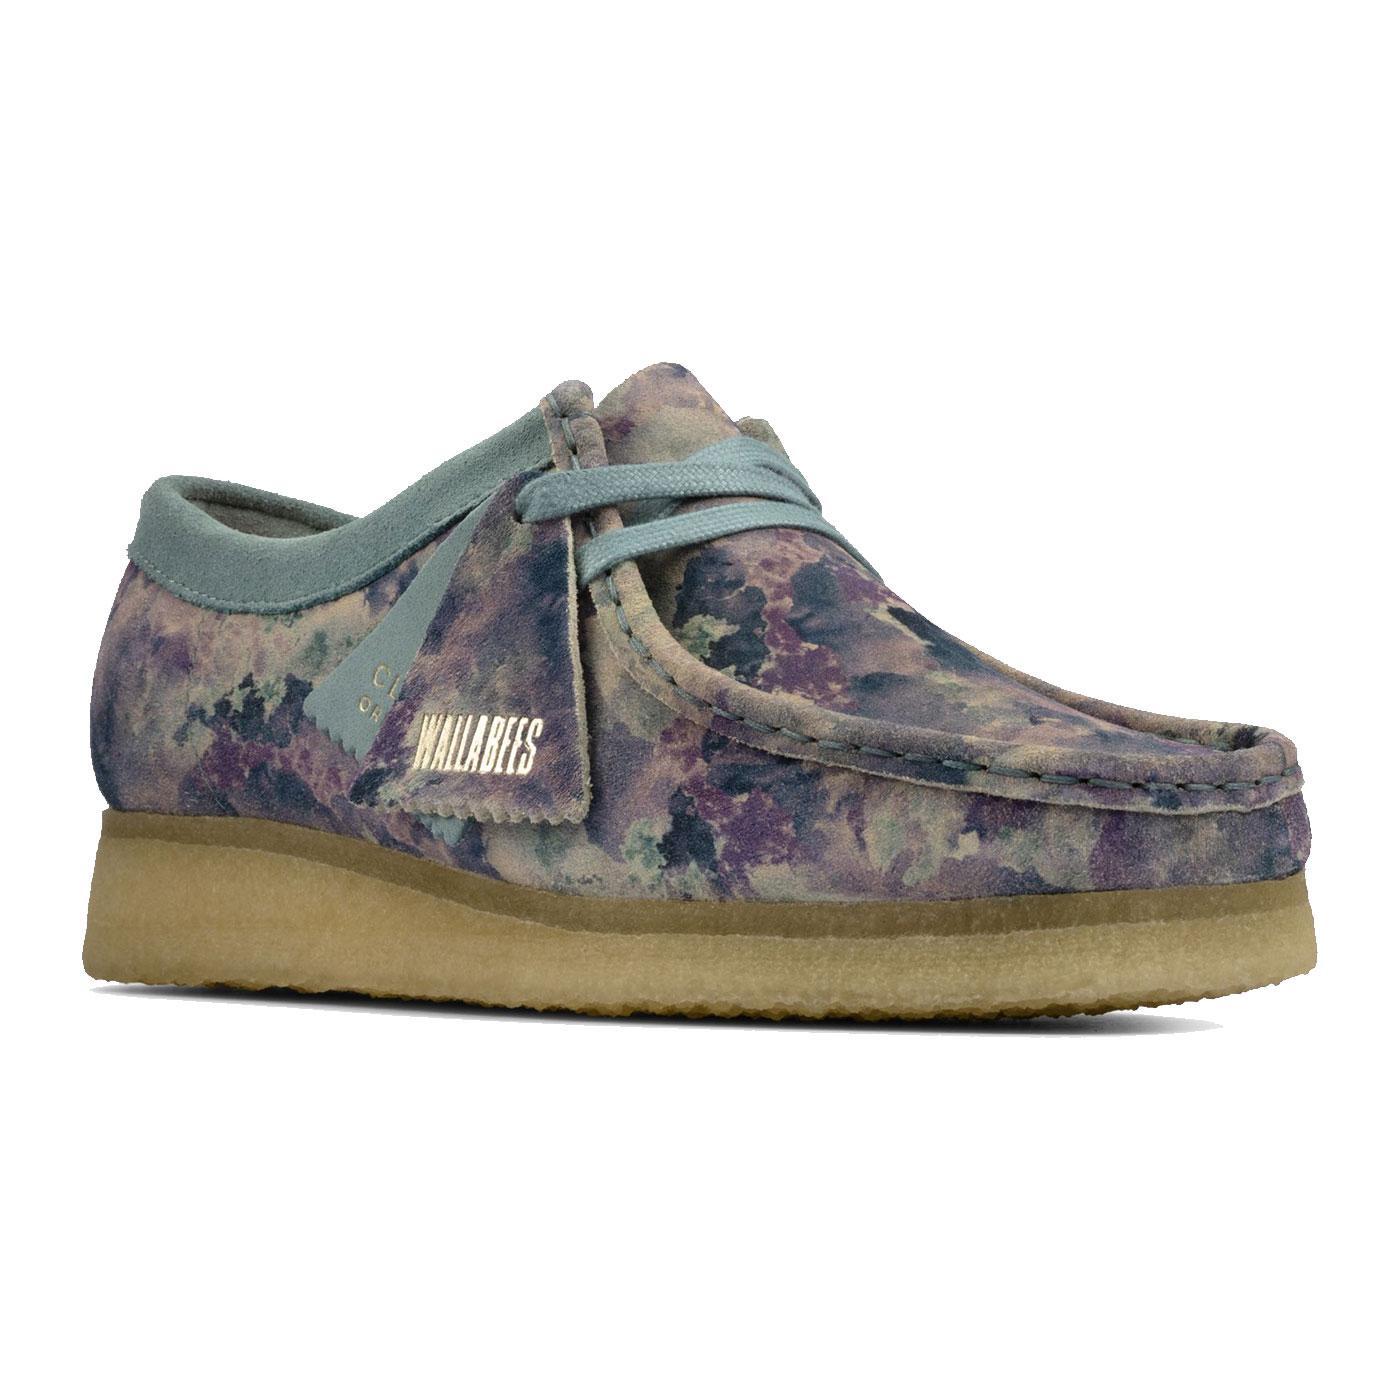 Wallabee CLARKS ORIGINALS Womens Moccasin Shoes BP